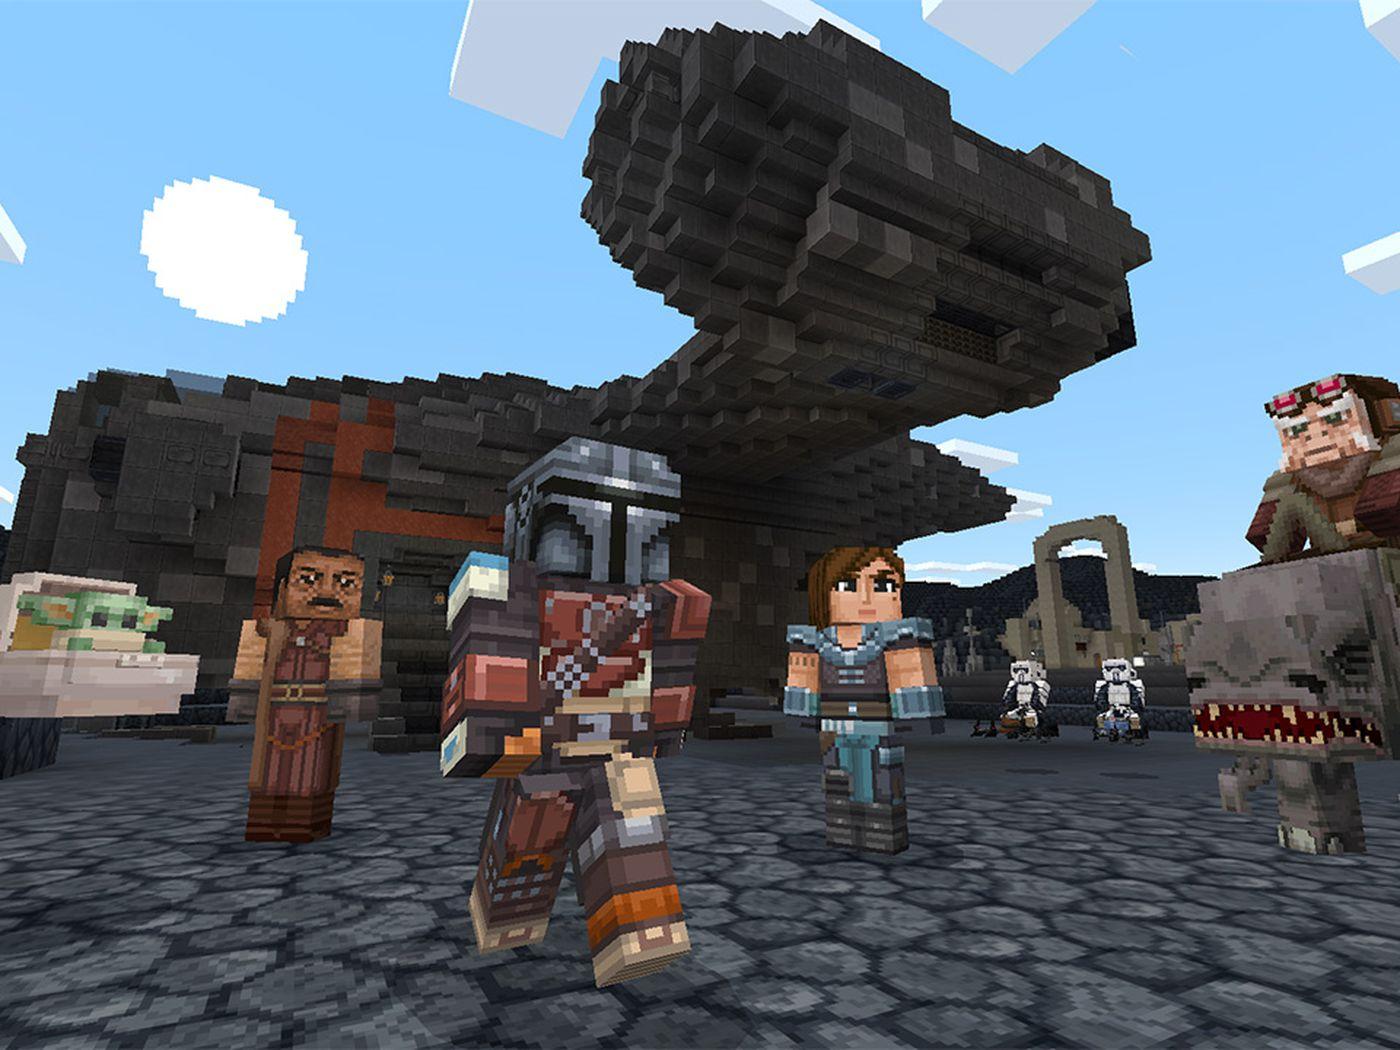 Minecraft Star Wars DLC adds Mandalorian, Baby Yoda, and original